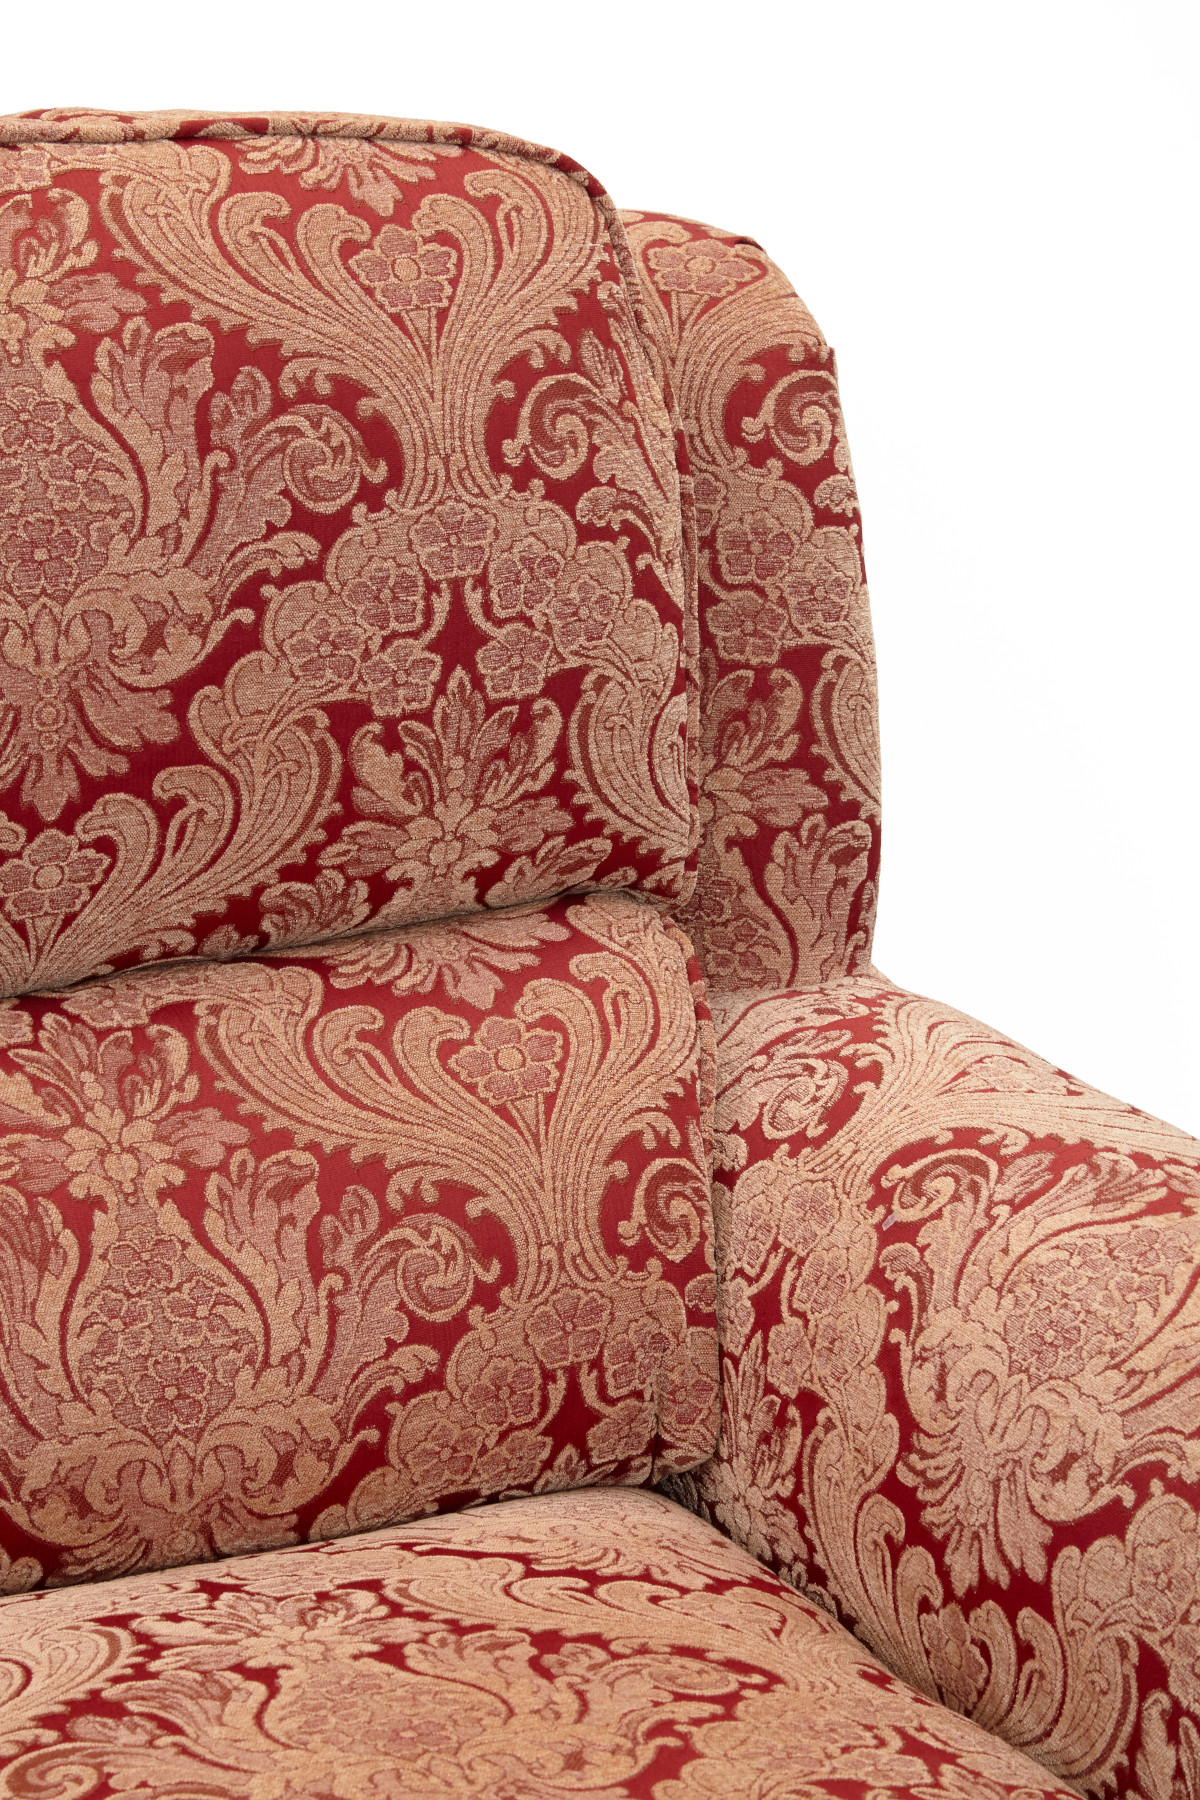 Parker Knoll Oakham 3 Seater Sofa